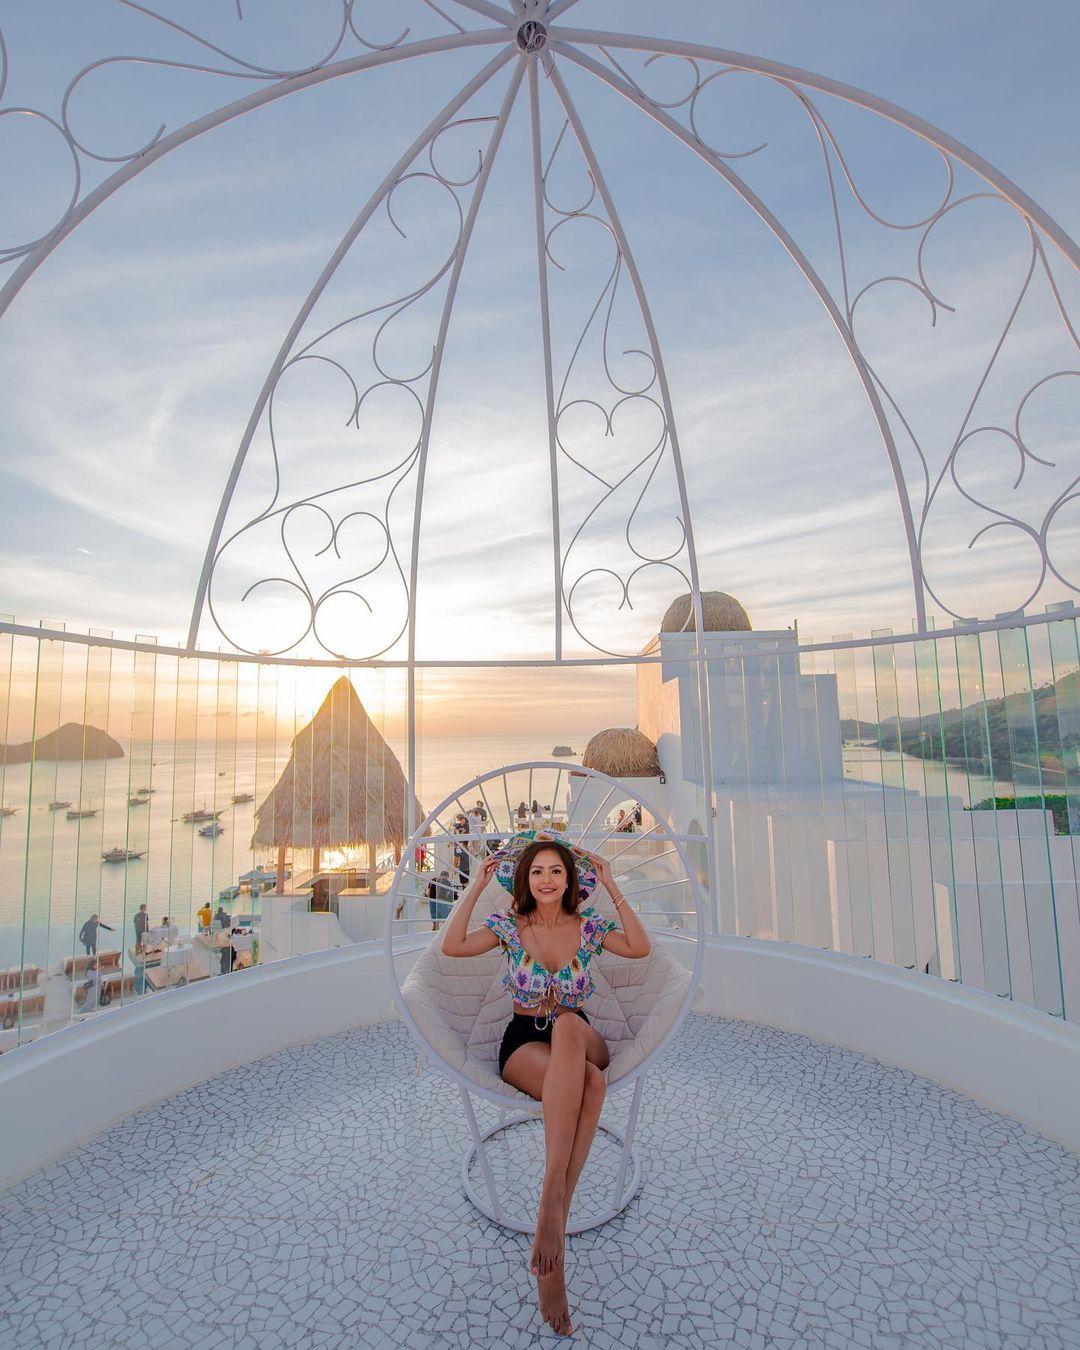 Sunset Di Loccal Collection Hotel Labuan Bajo Image From @dj_yasmin